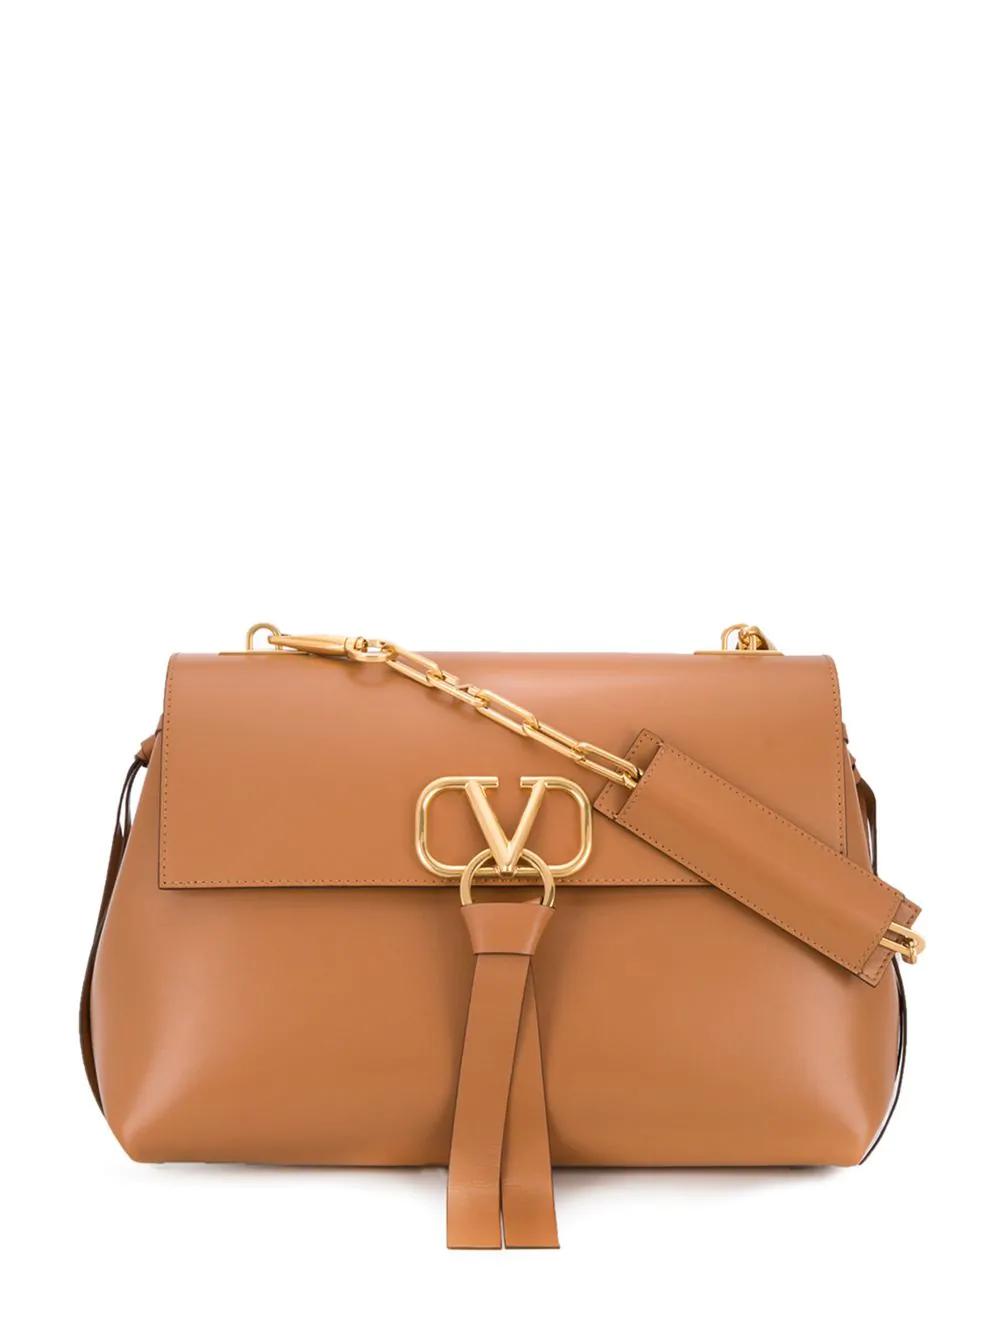 44f755a8fe Valentino Garavani Vring Shoulder Bag - Neutrals | ModeSens